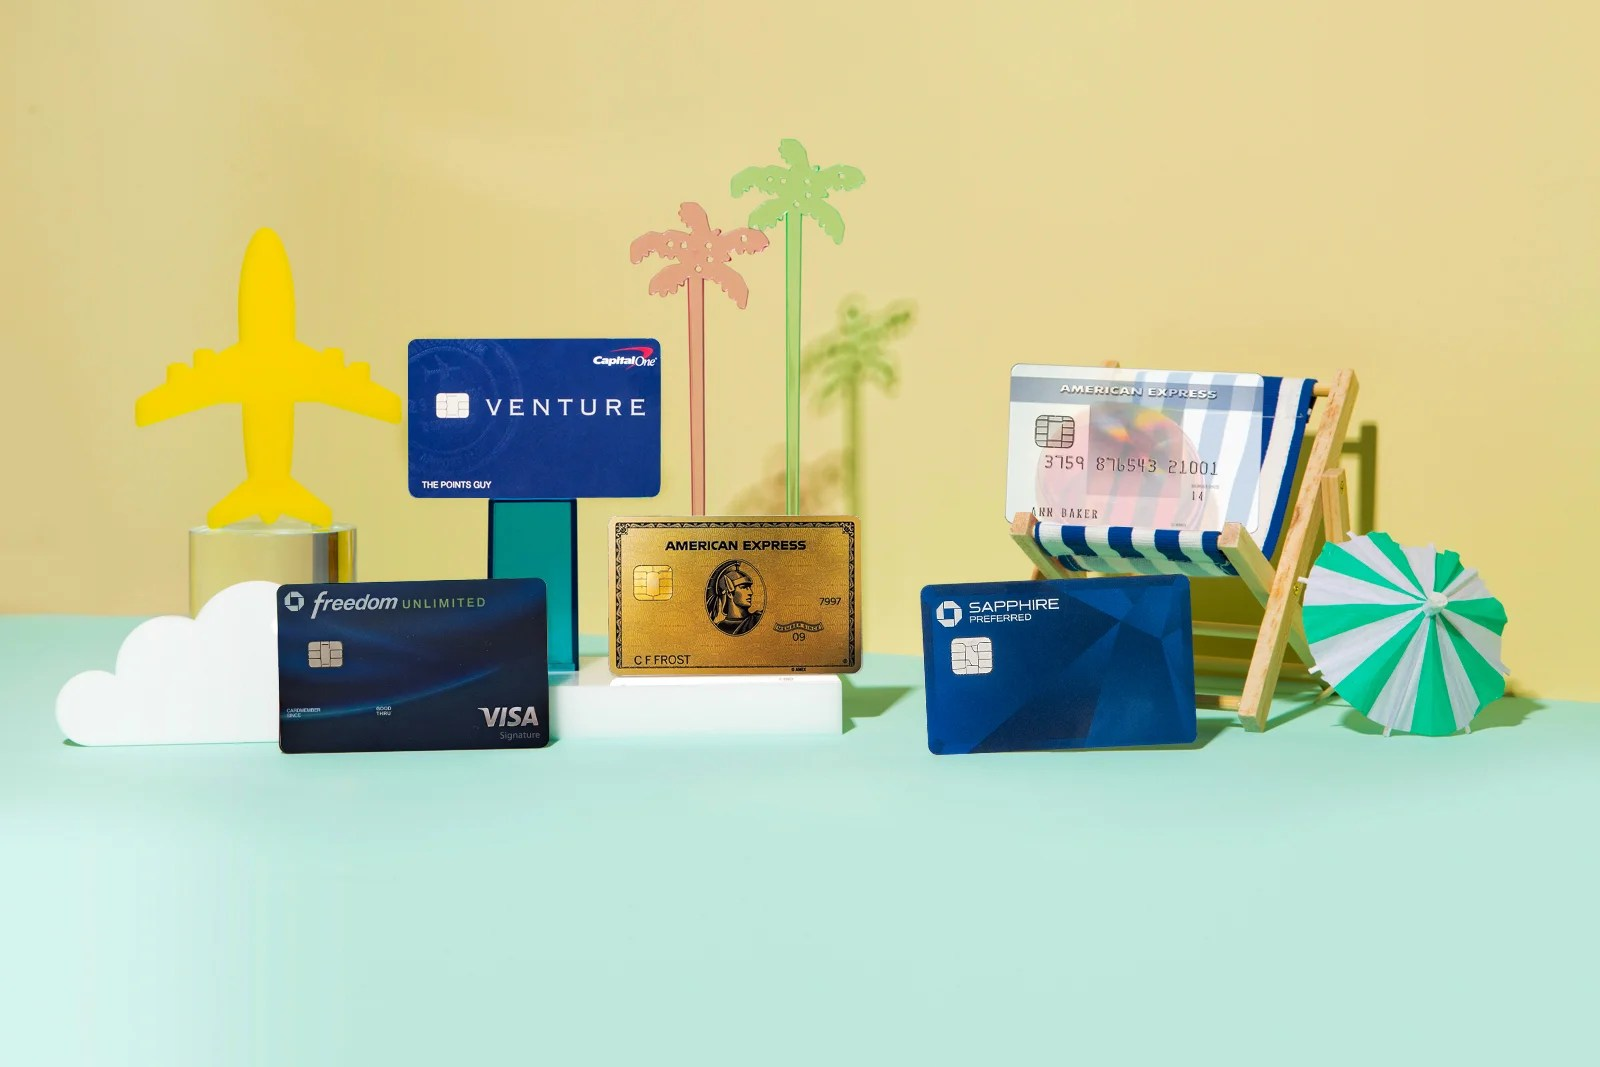 capital one business credit card uk кредит на машину без первоначального взноса в спб